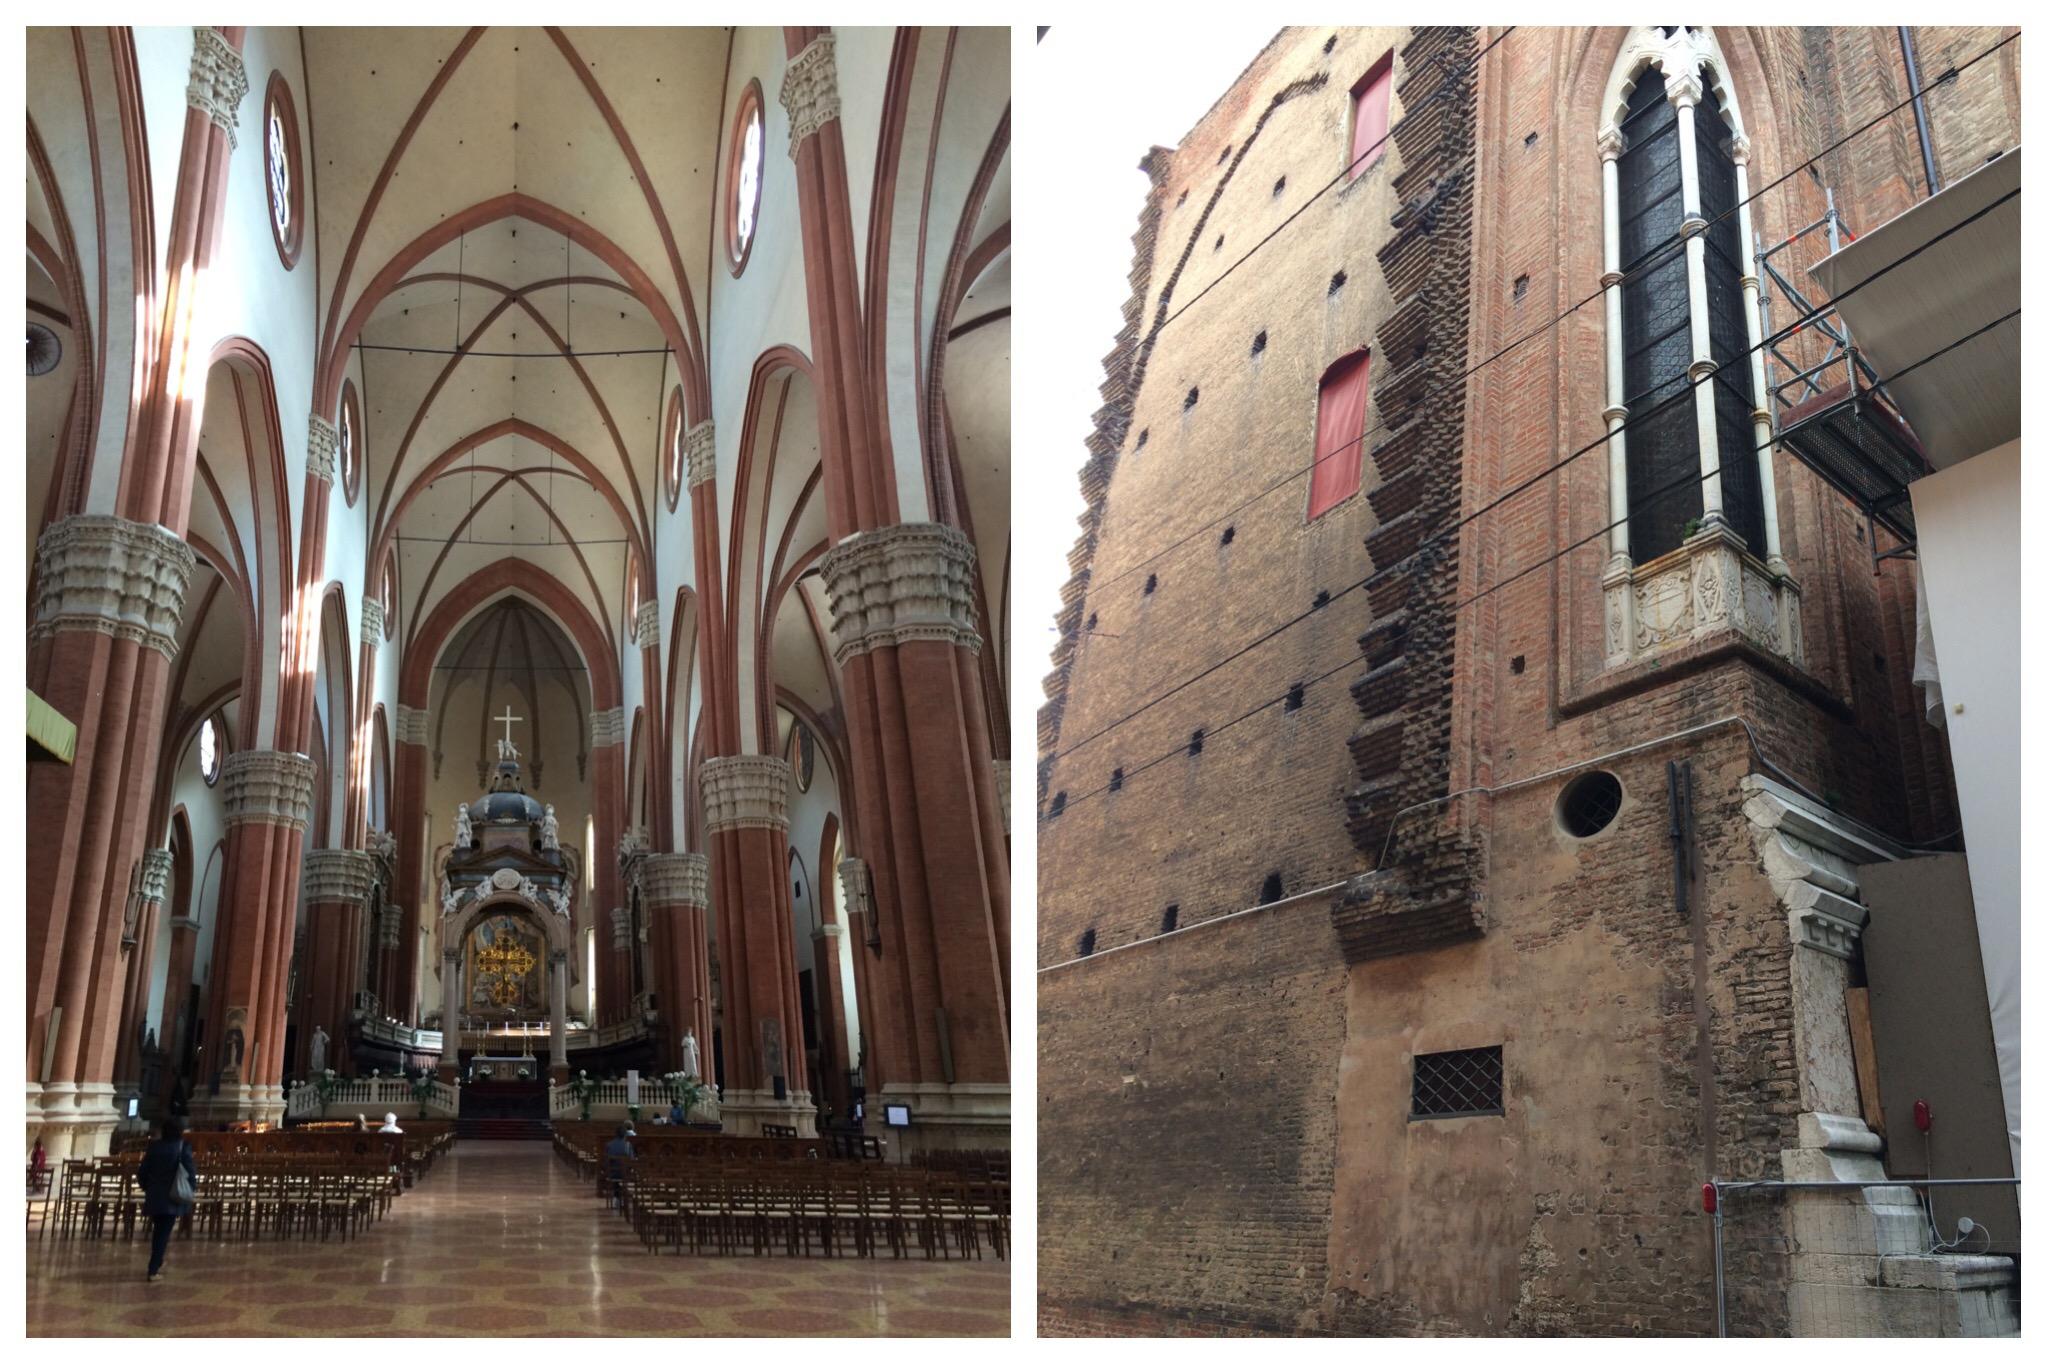 Bologna - San Petronio basilica